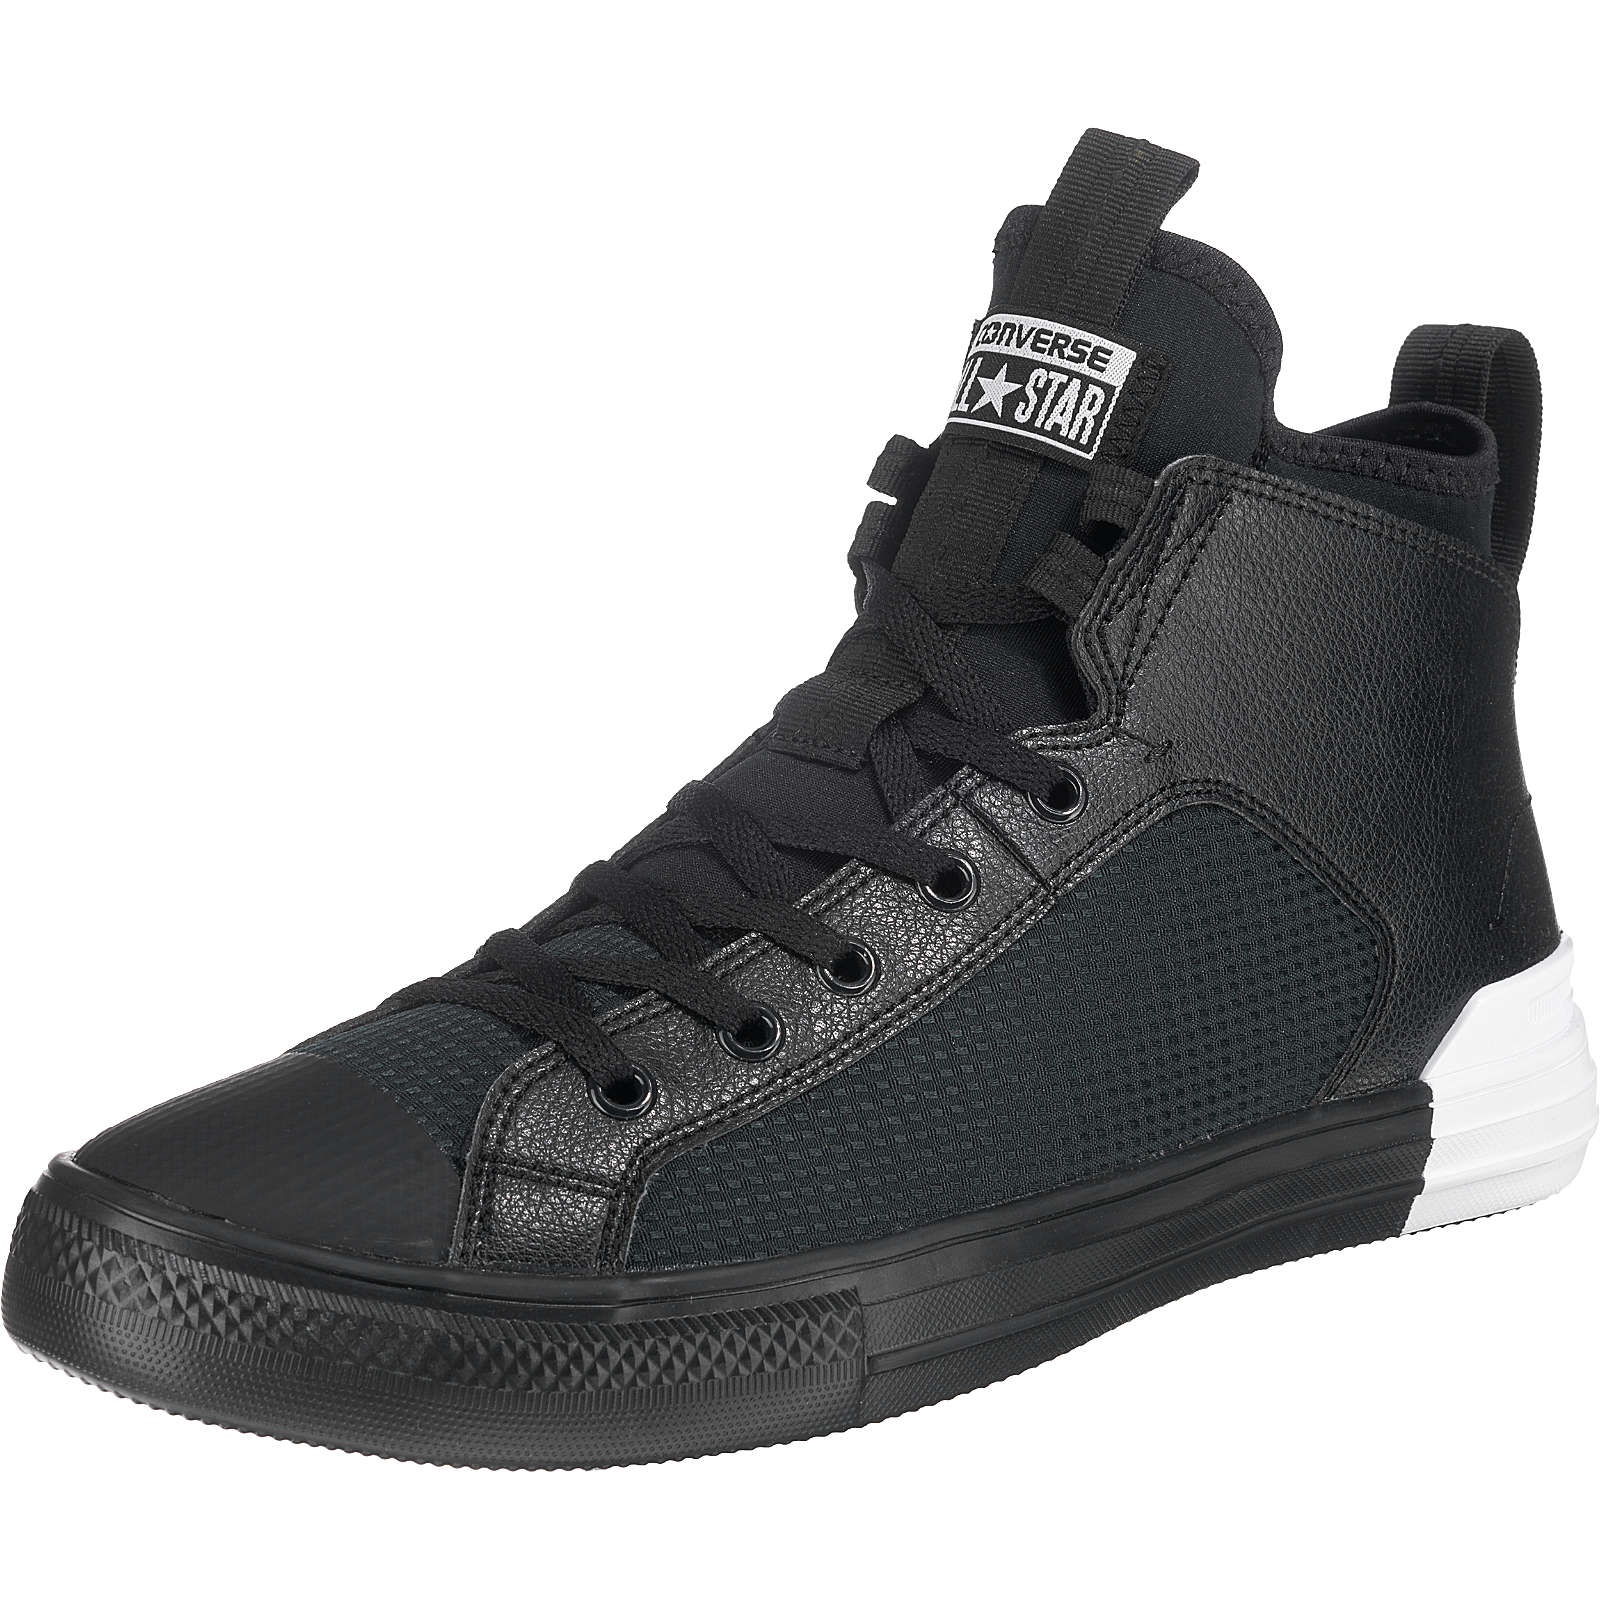 CONVERSE Chuck Taylor All Star Ultra Mid Sneakers schwarz-kombi Herren Gr. 45